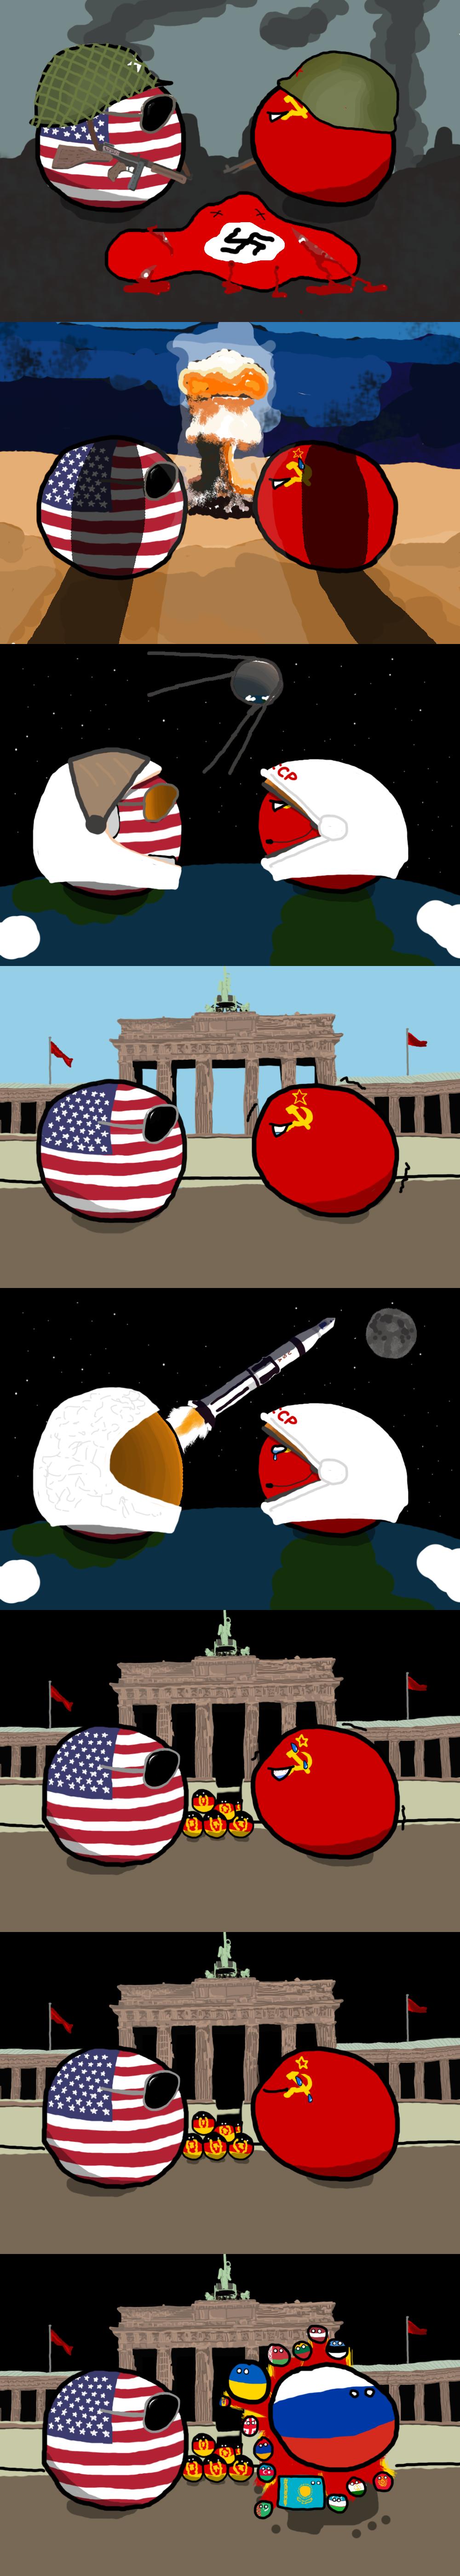 cold war essay contest